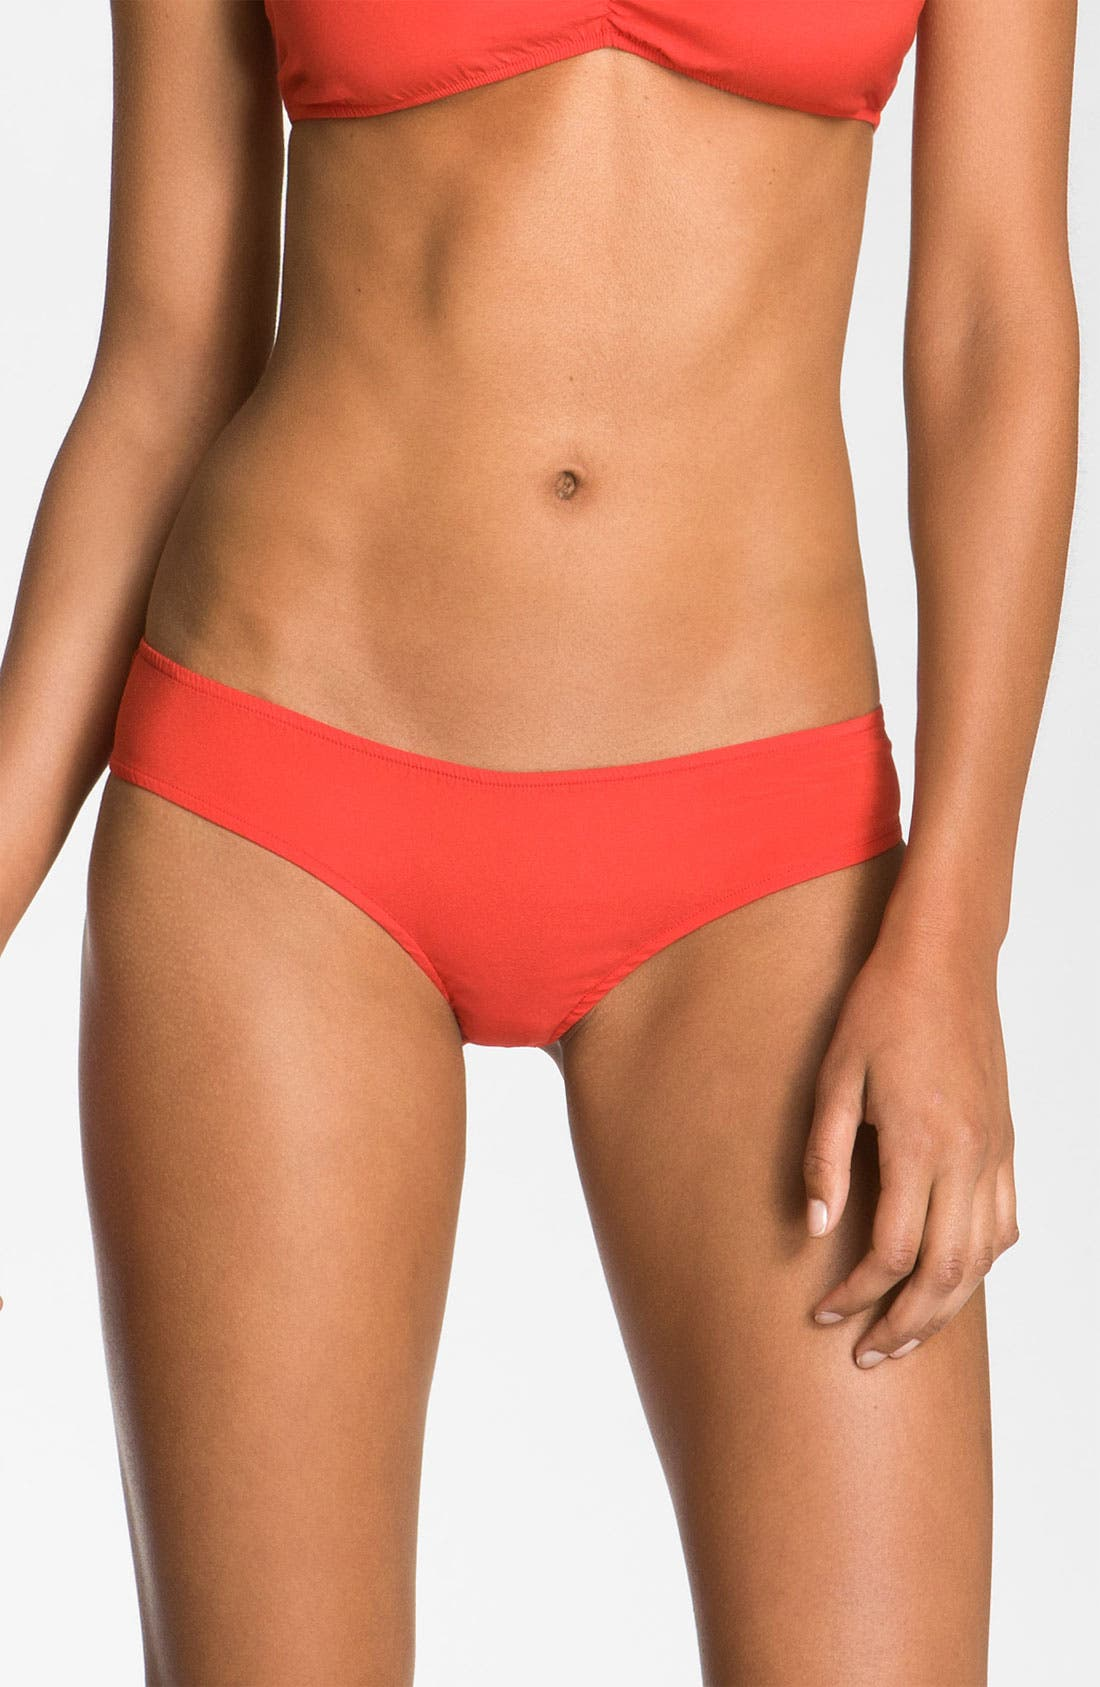 Alternate Image 1 Selected - Zinke 'Pow Wow' Panties